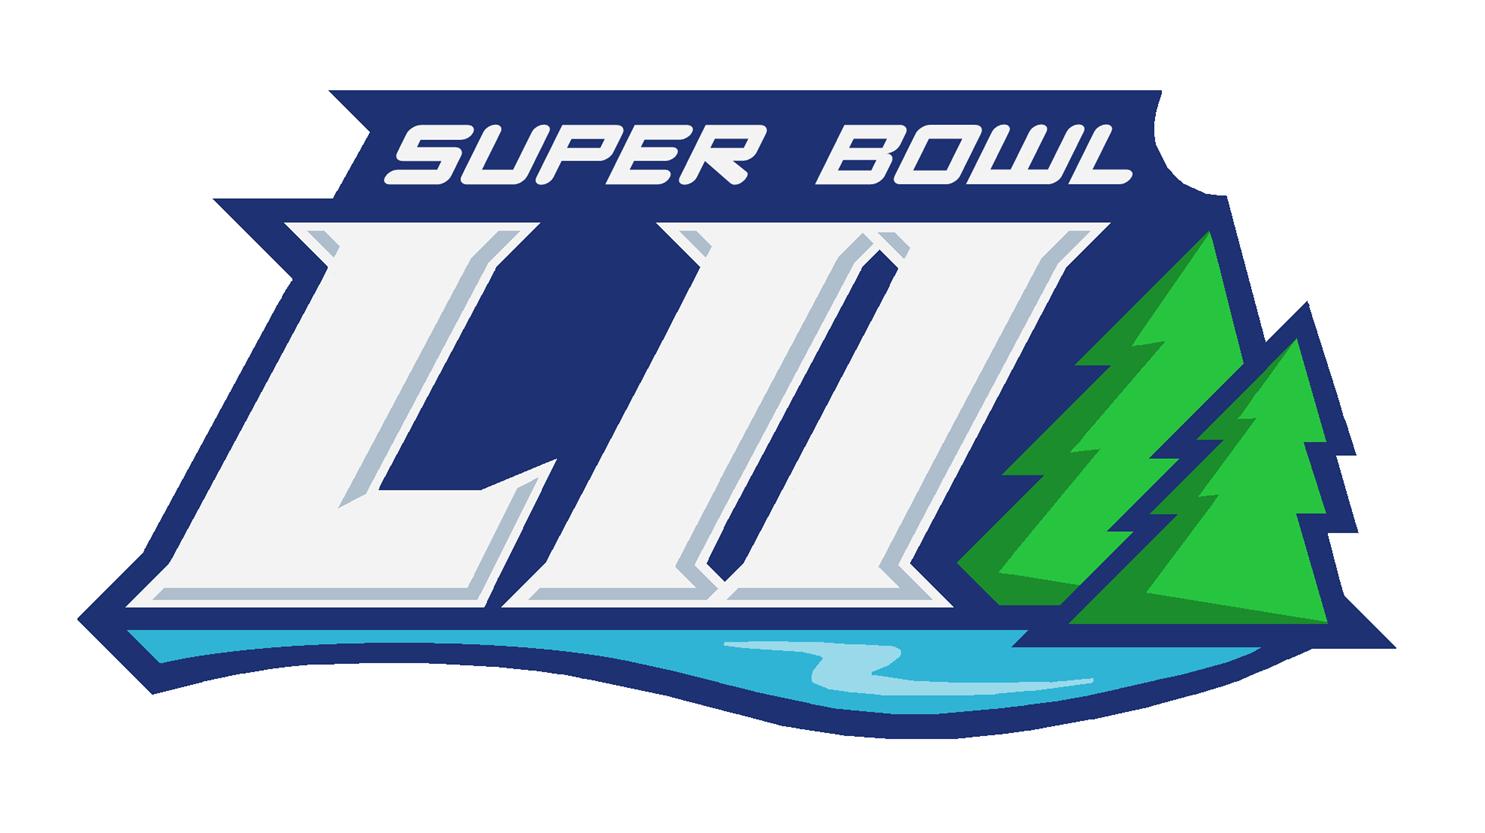 Super bowl 52 logo clipart graphic free download Super Bowl LII Logo Concept - Concepts - Chris Creamer\'s ... graphic free download